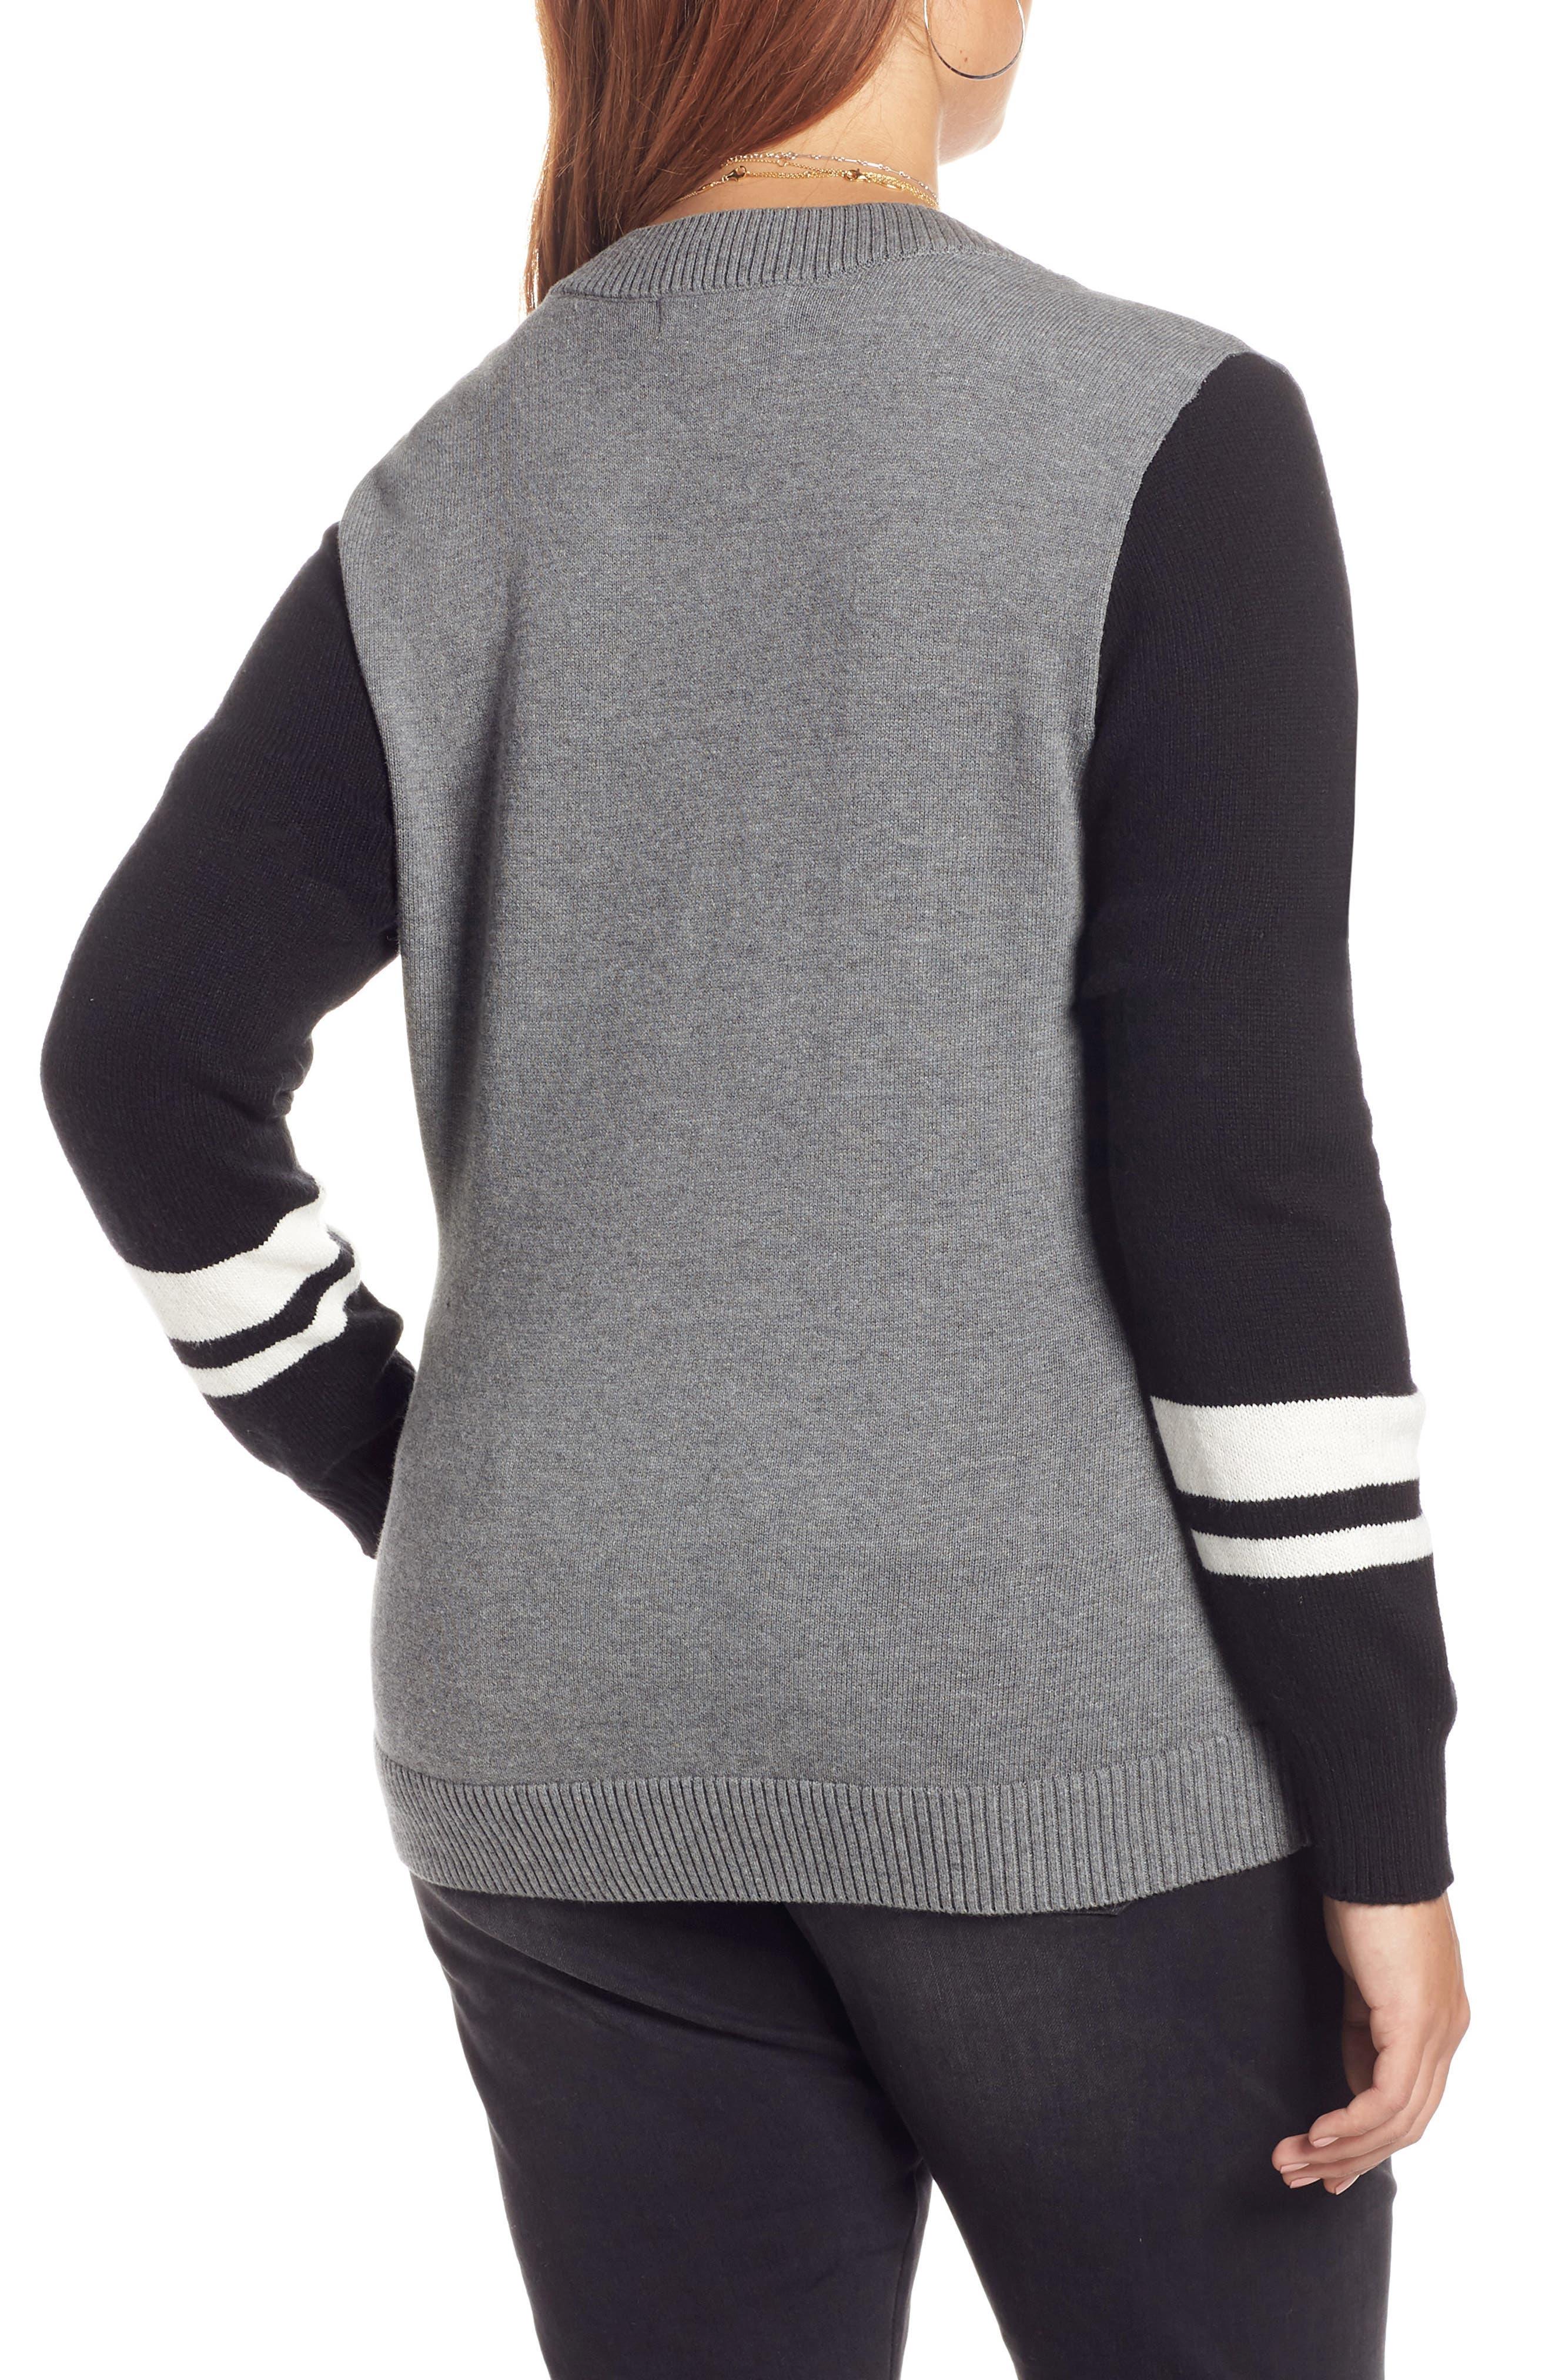 Stripe V-Neck Sweater,                             Alternate thumbnail 8, color,                             GREY HEATHER COMBO